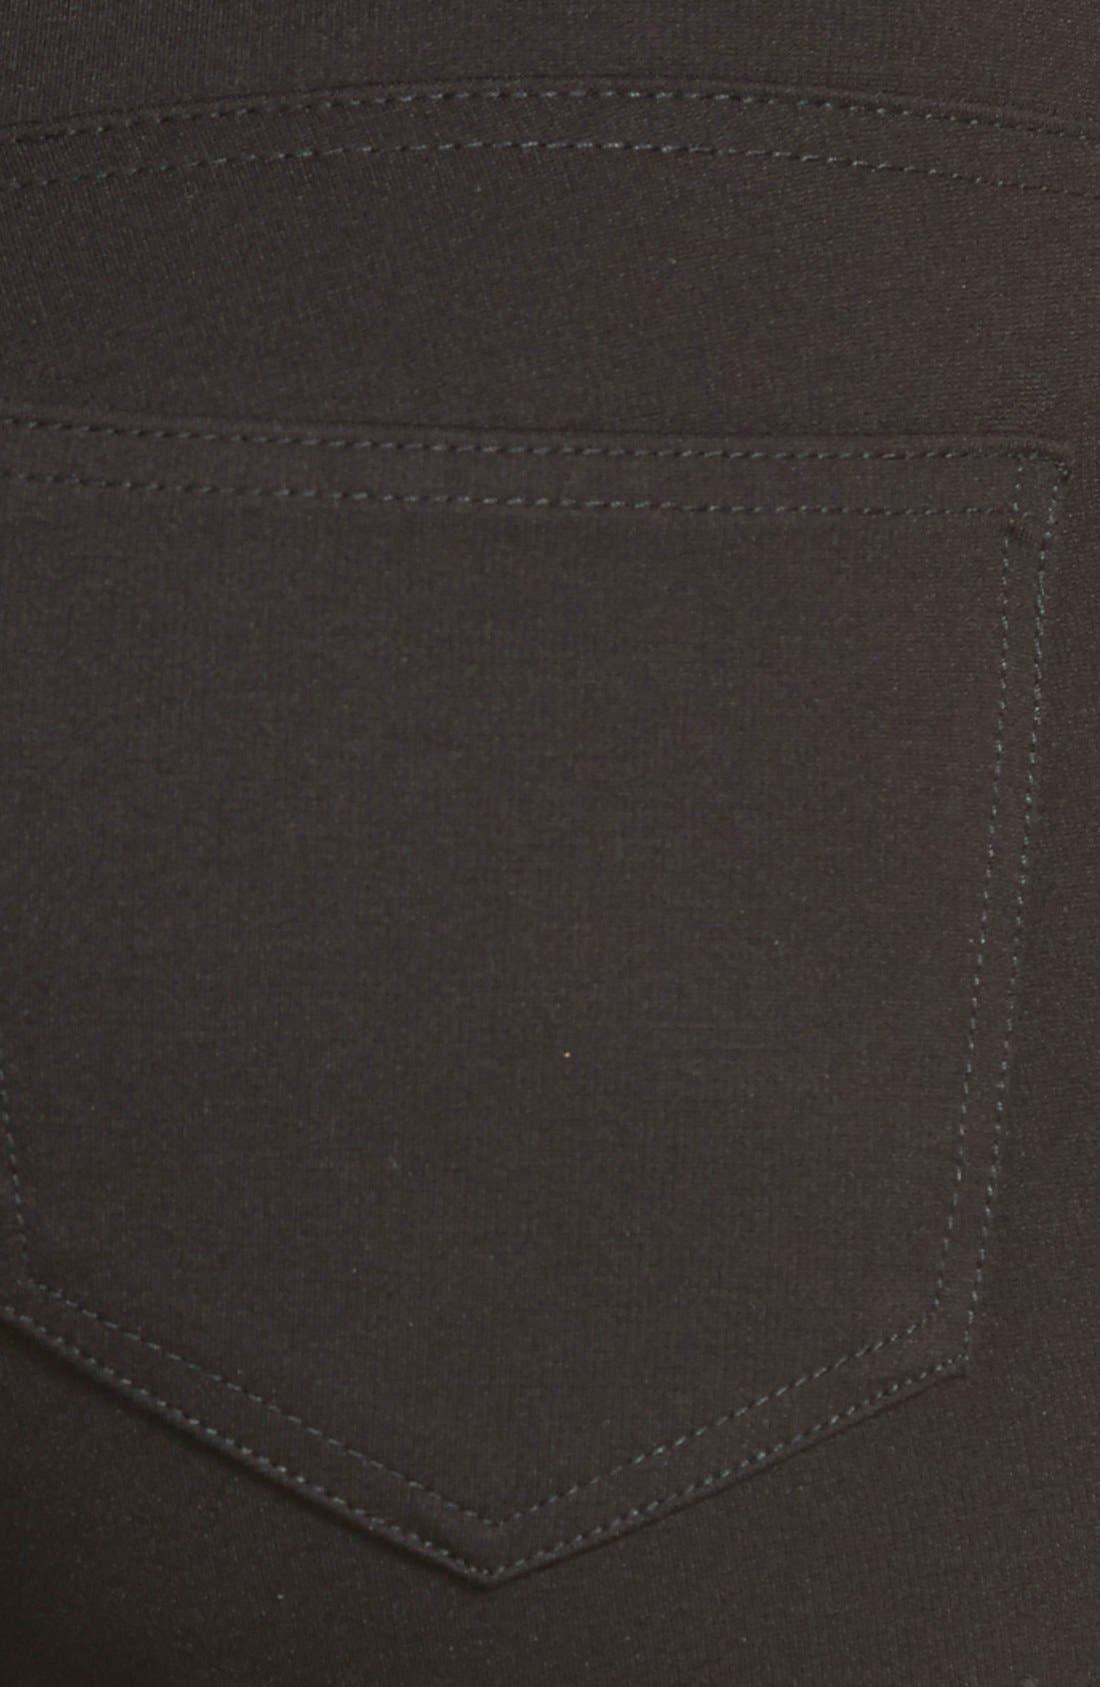 Alternate Image 3  - KUT from the Kloth 'Mia' Stretch Knit Five-Pocket Skinny Pants